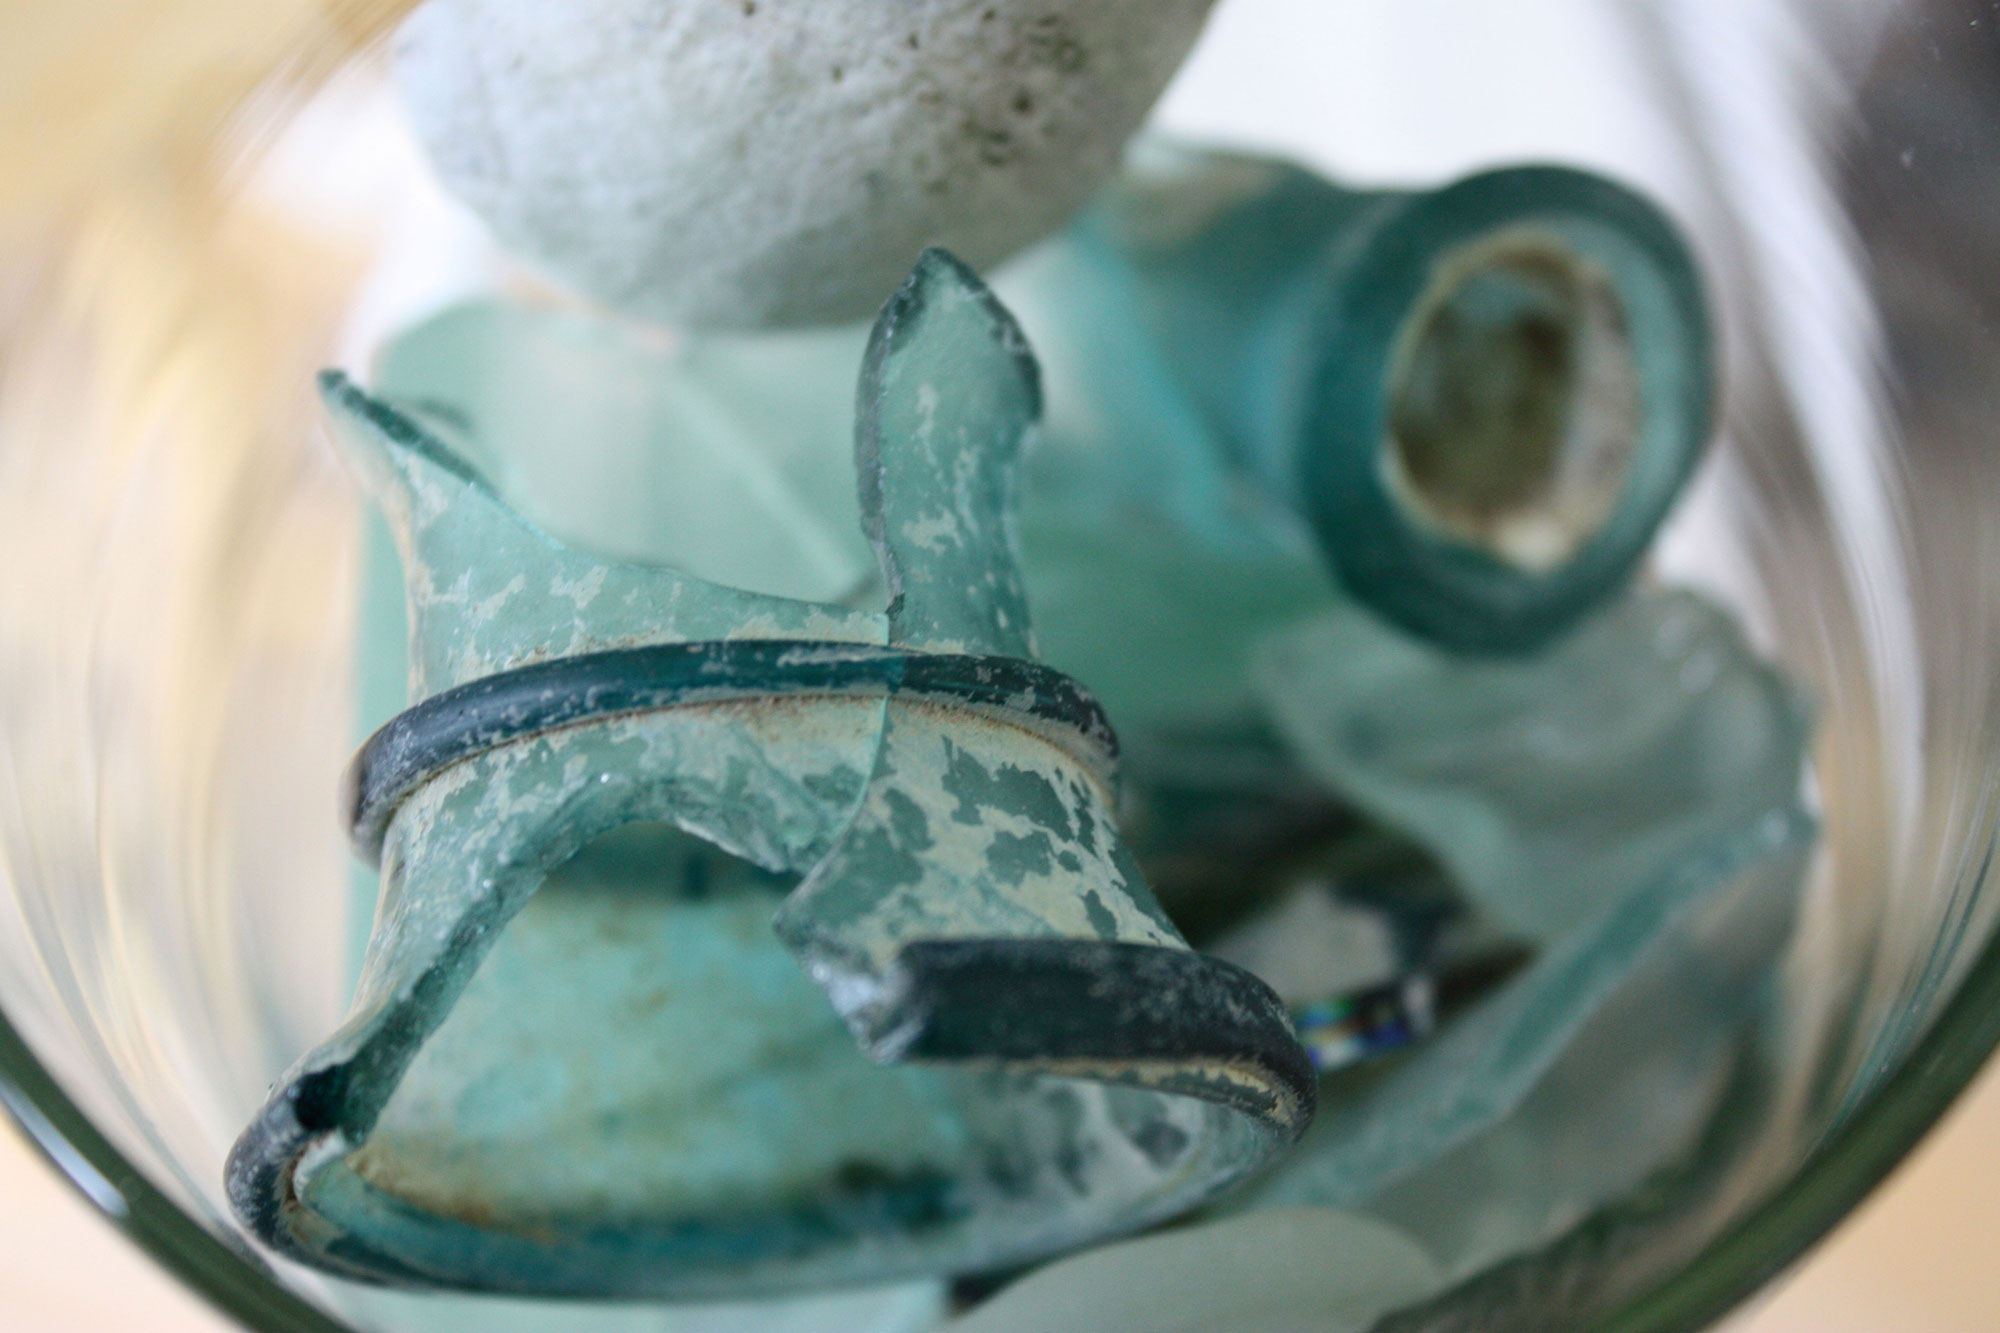 32_Old-Teal-Glass_rgb_opt_web.jpg